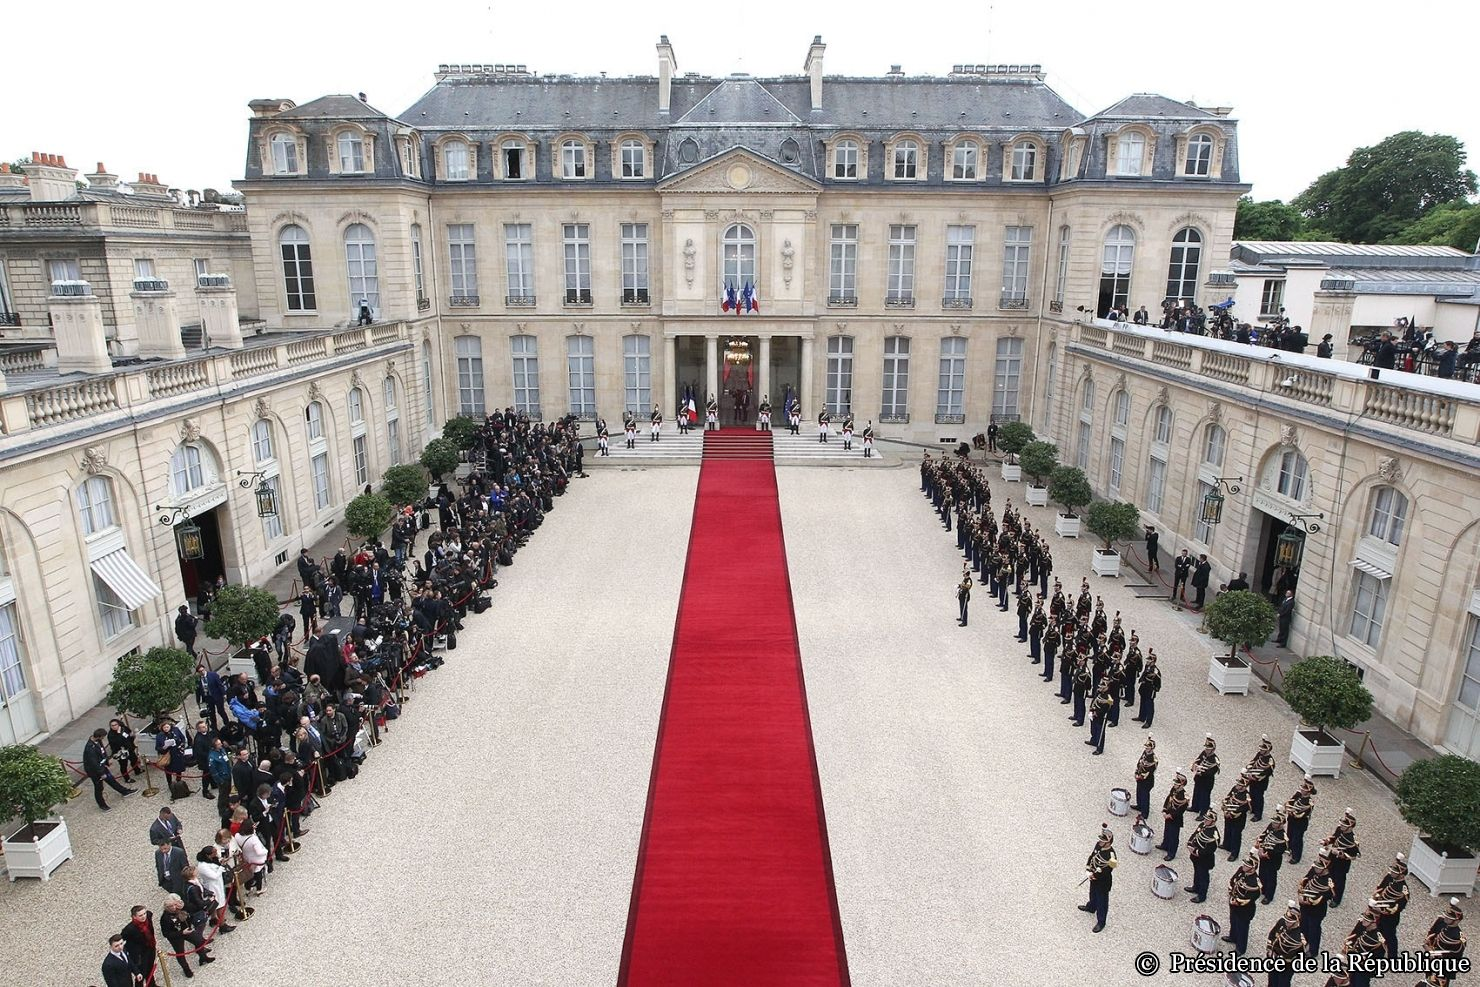 Emmanuel Macron's Nomination Ceremony. Elysée Palace, 75008 Paris. May 14th 2017  #Macron #France